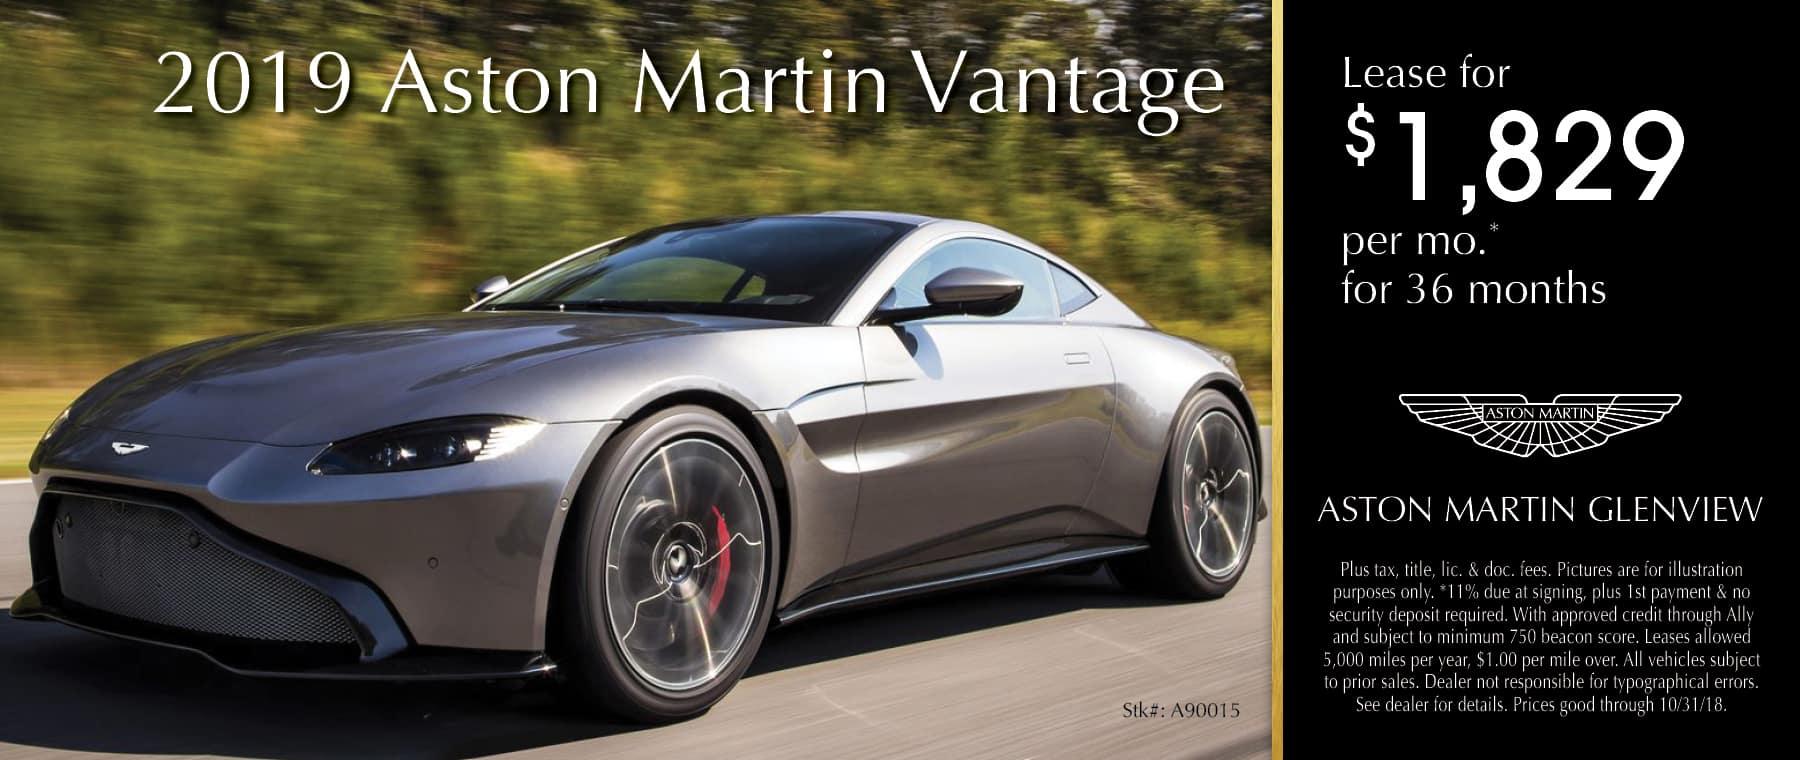 Glenview Luxury Imports Aston Martin Lotus Dealer In Chicagoland - Aston martin near me